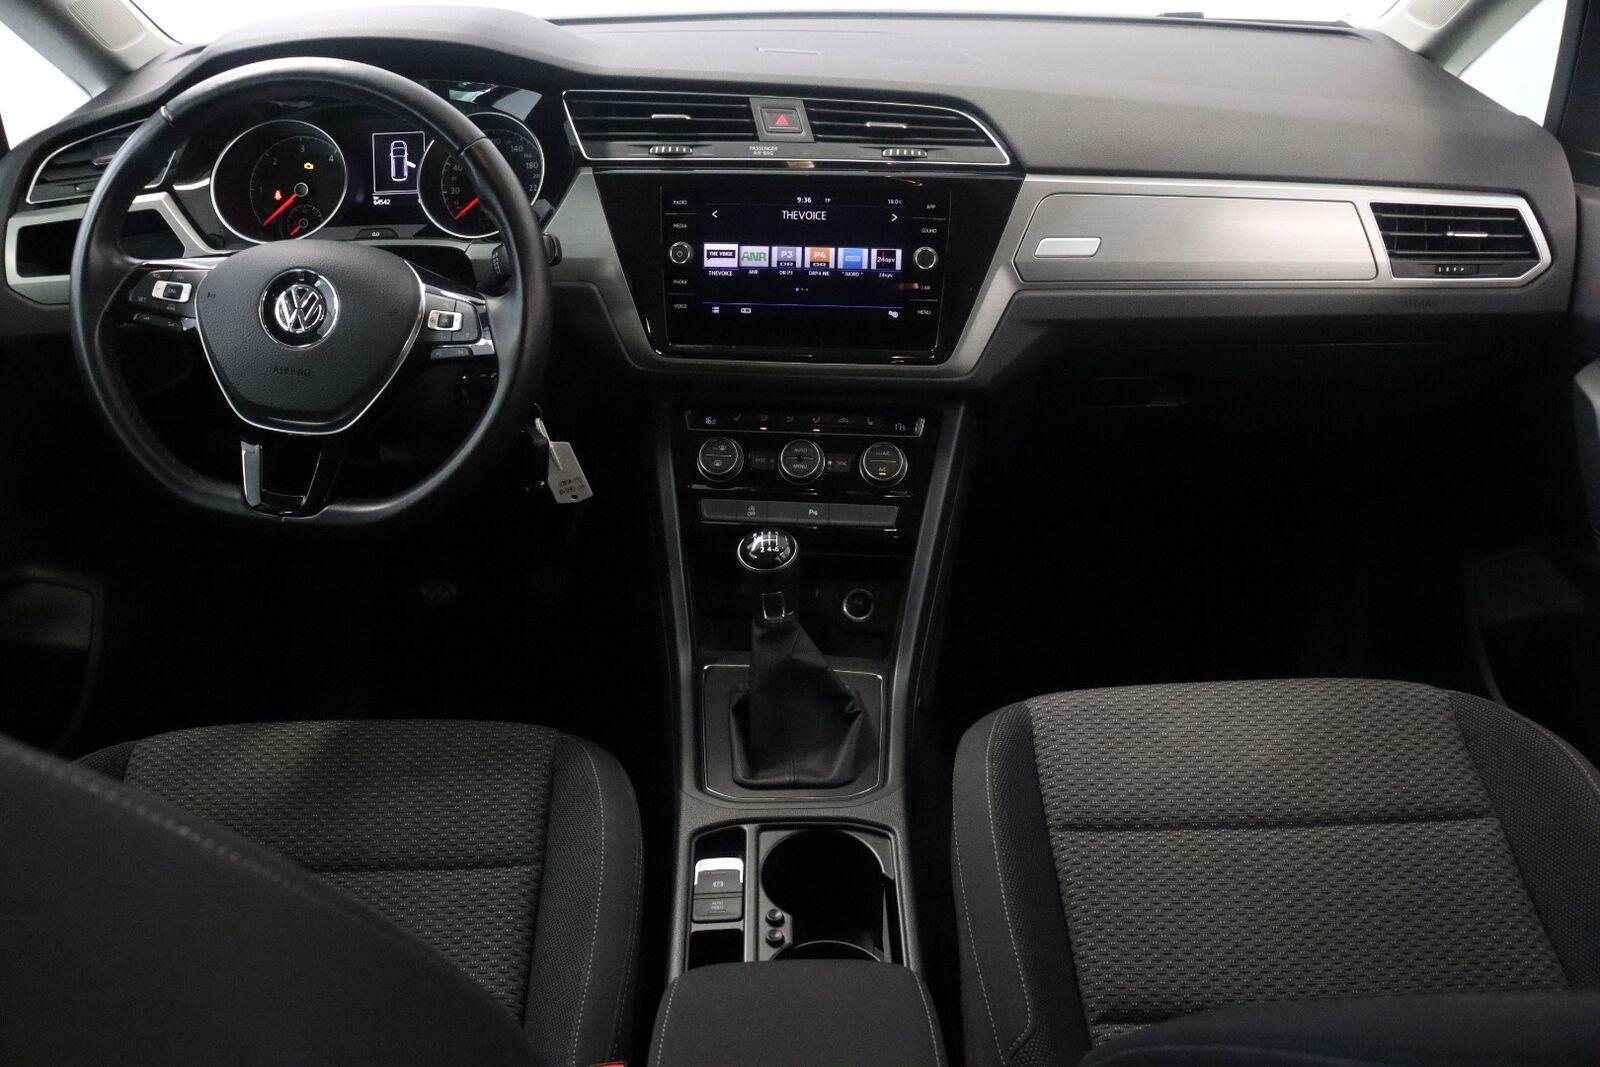 VW Touran TDi 115 Comfortline 7prs